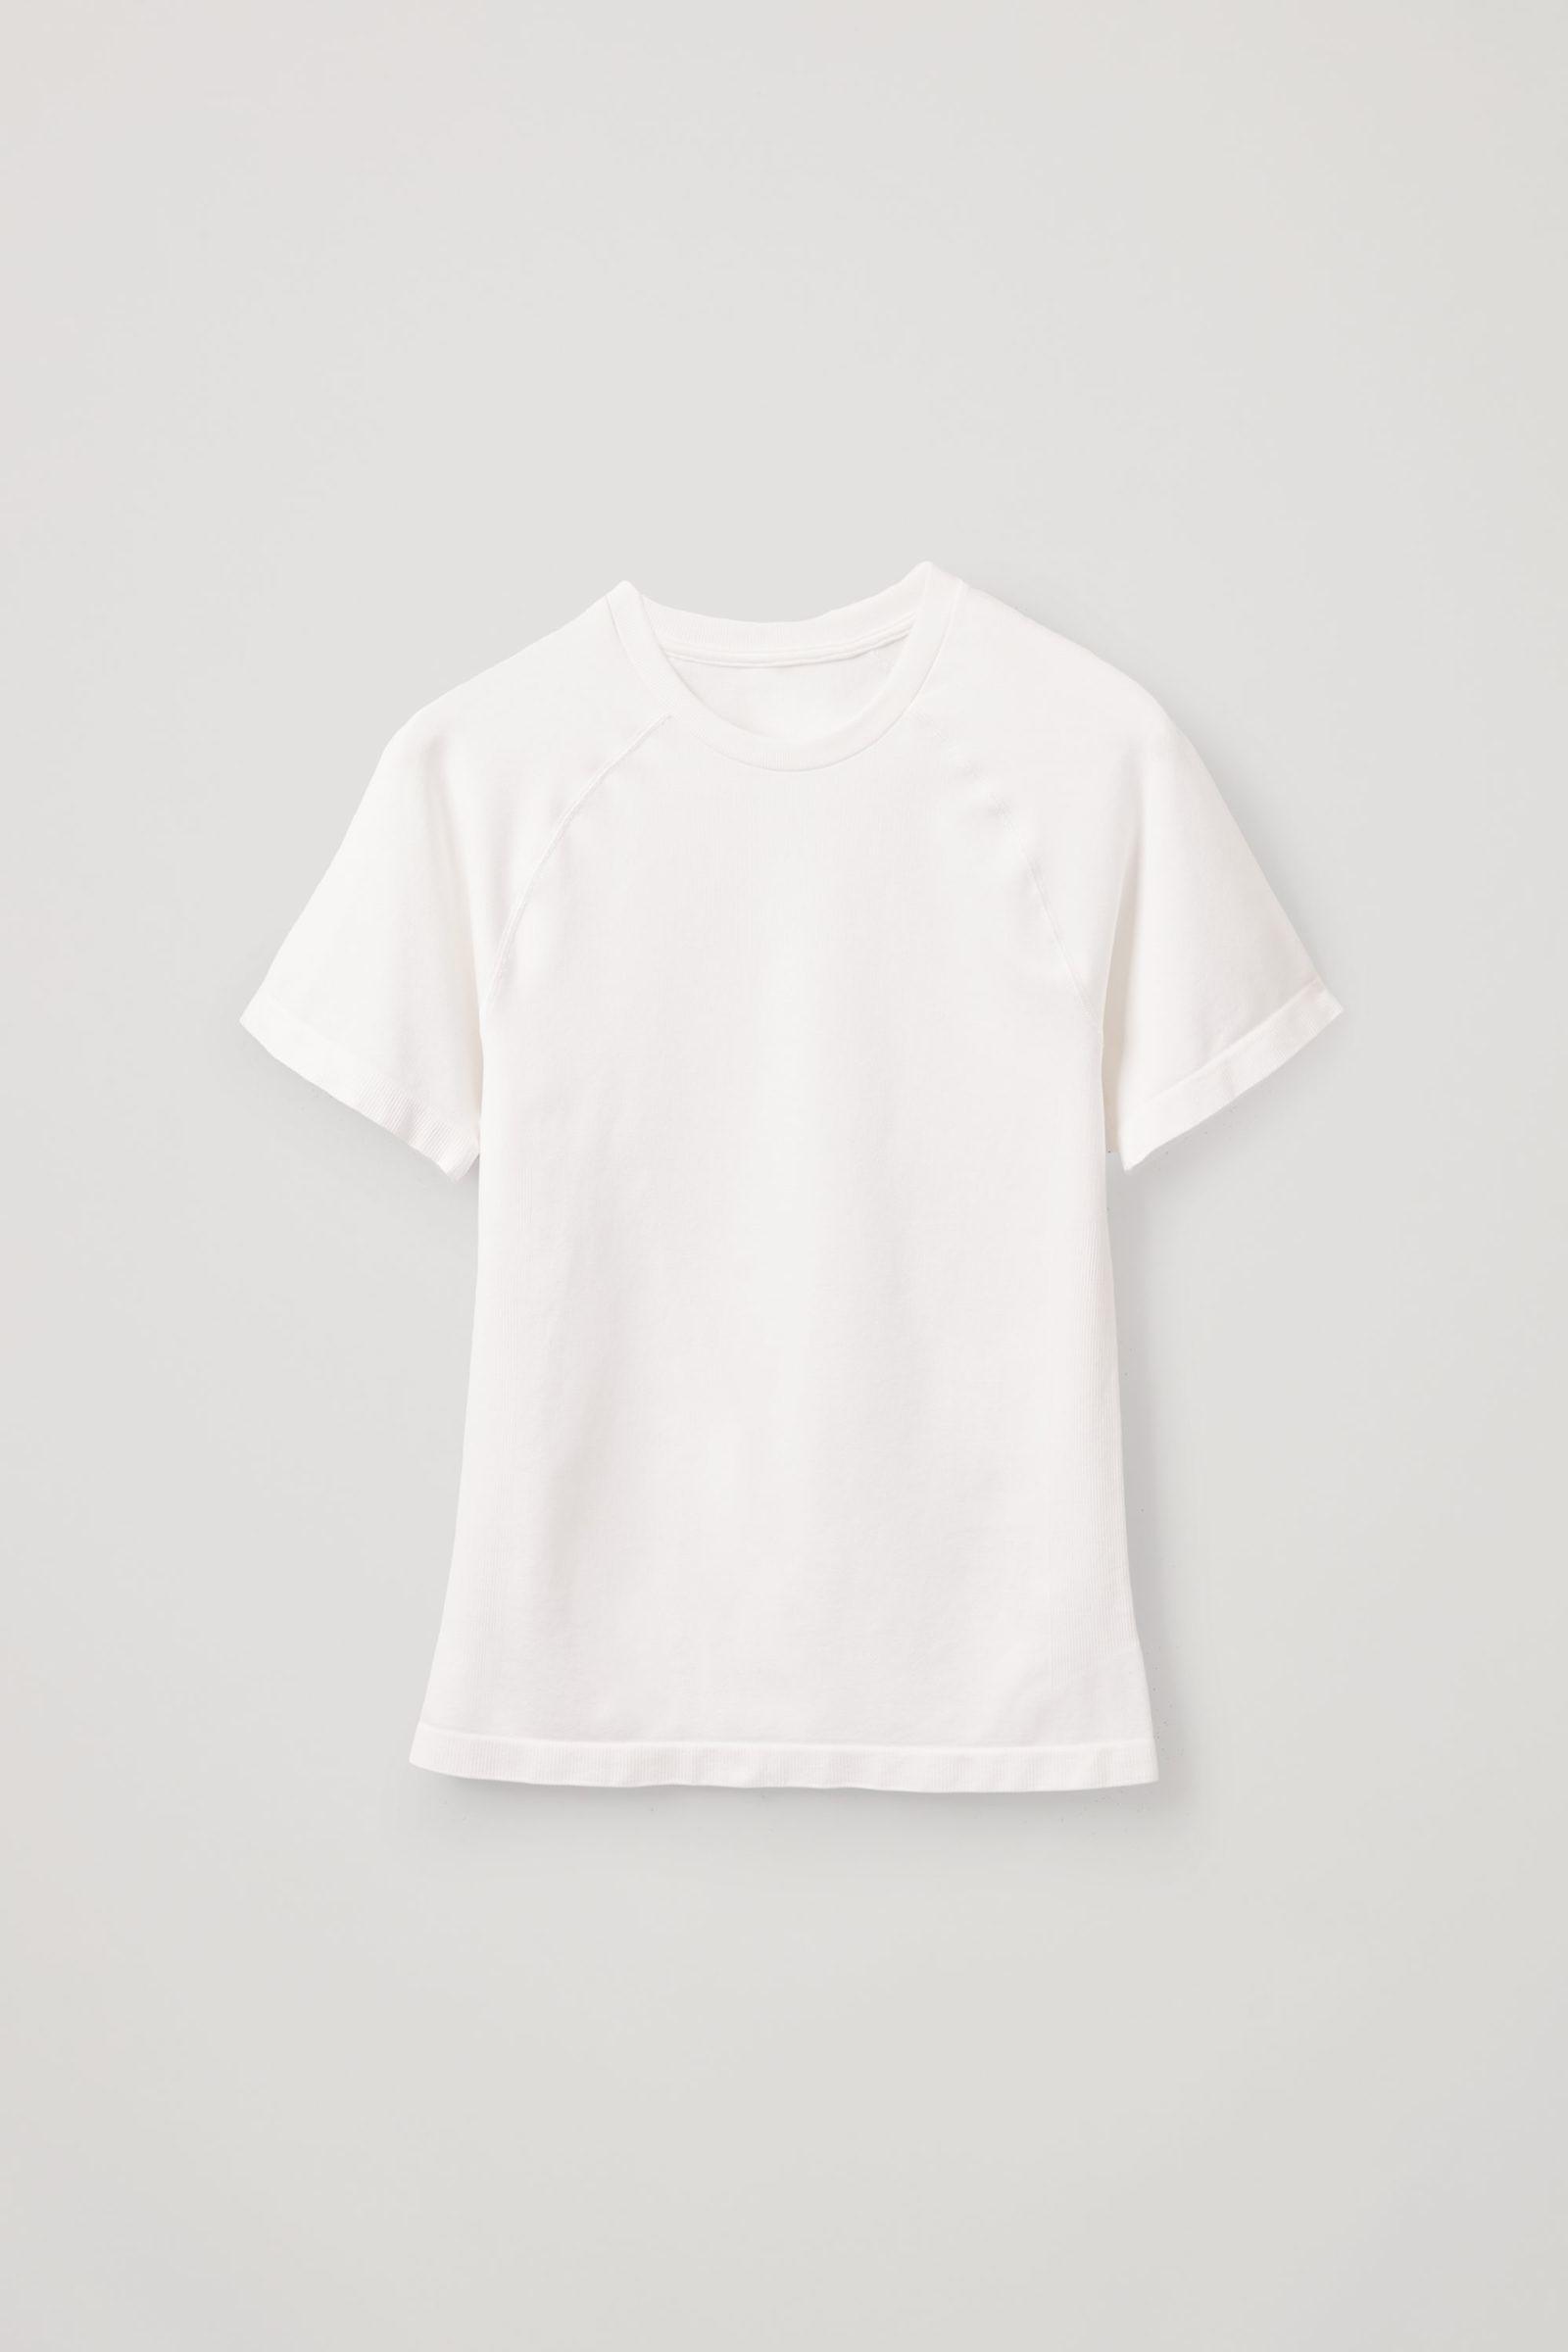 COS 슬림핏 심리스 티셔츠의 화이트컬러 Product입니다.